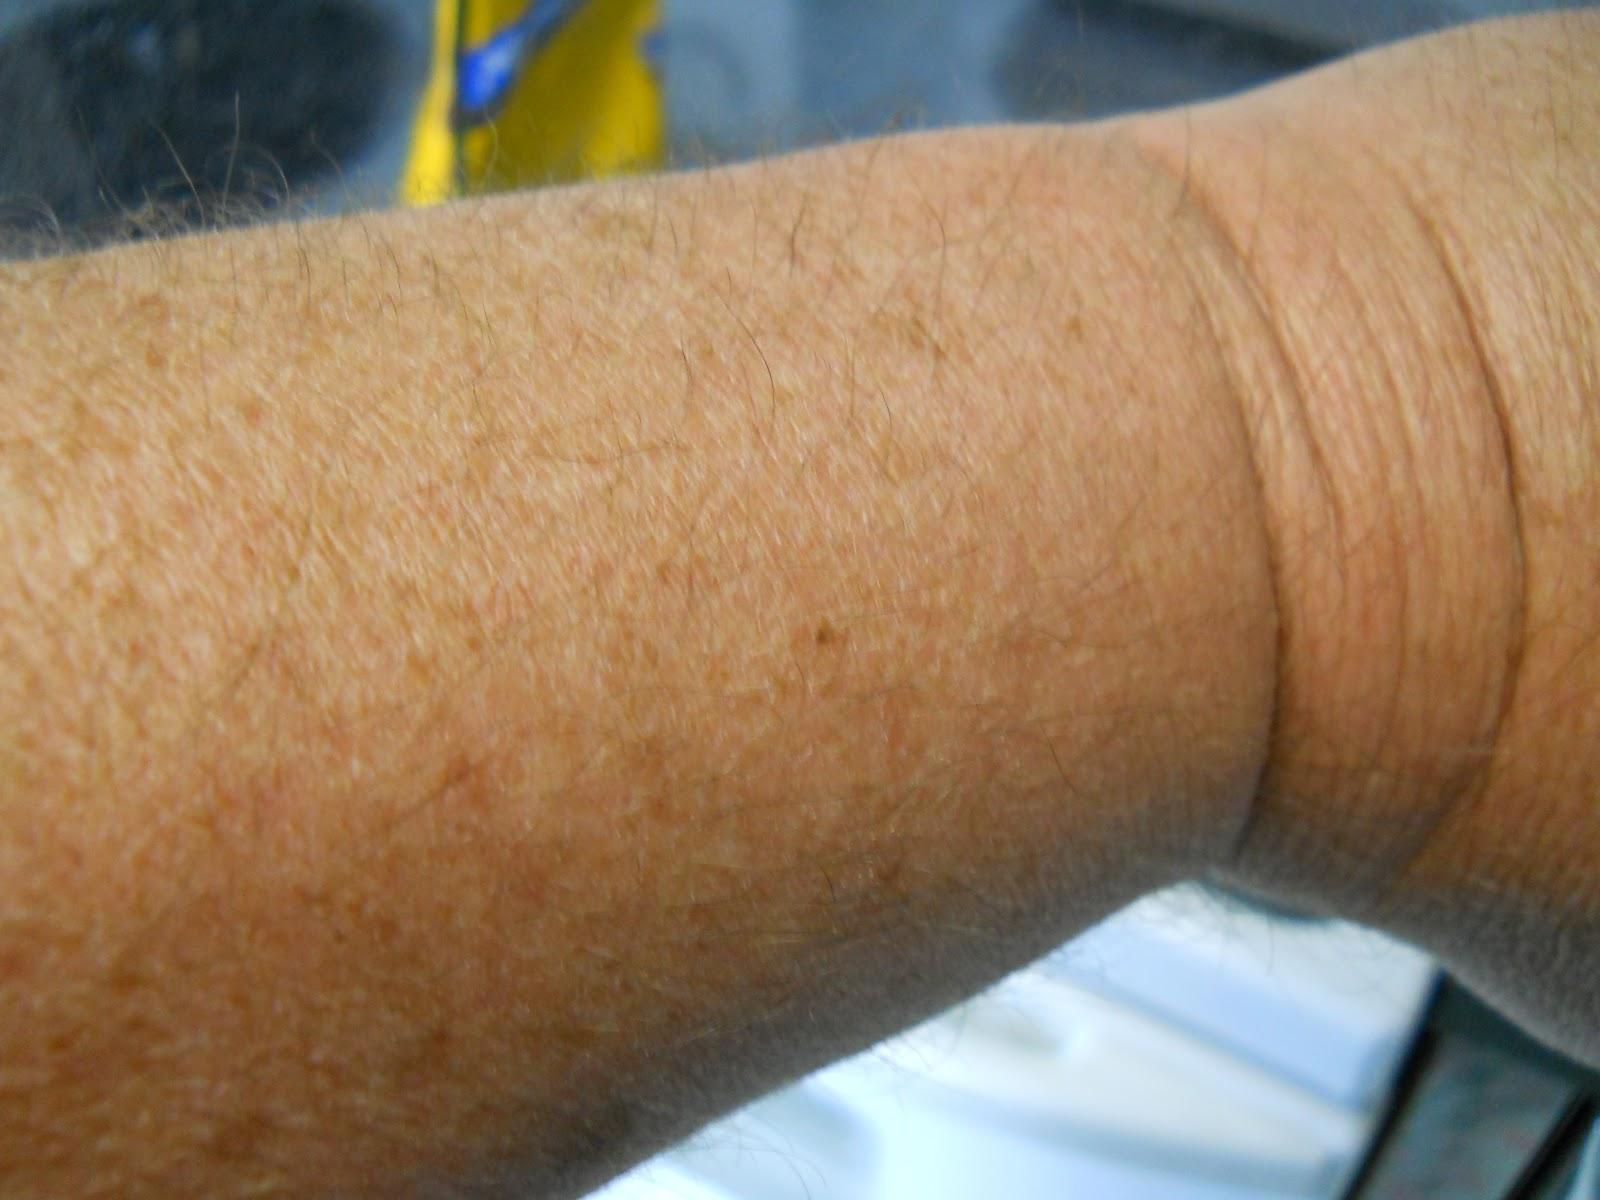 610 Credit Score >> Swollen Wrist Related Keywords - Swollen Wrist Long Tail Keywords KeywordsKing